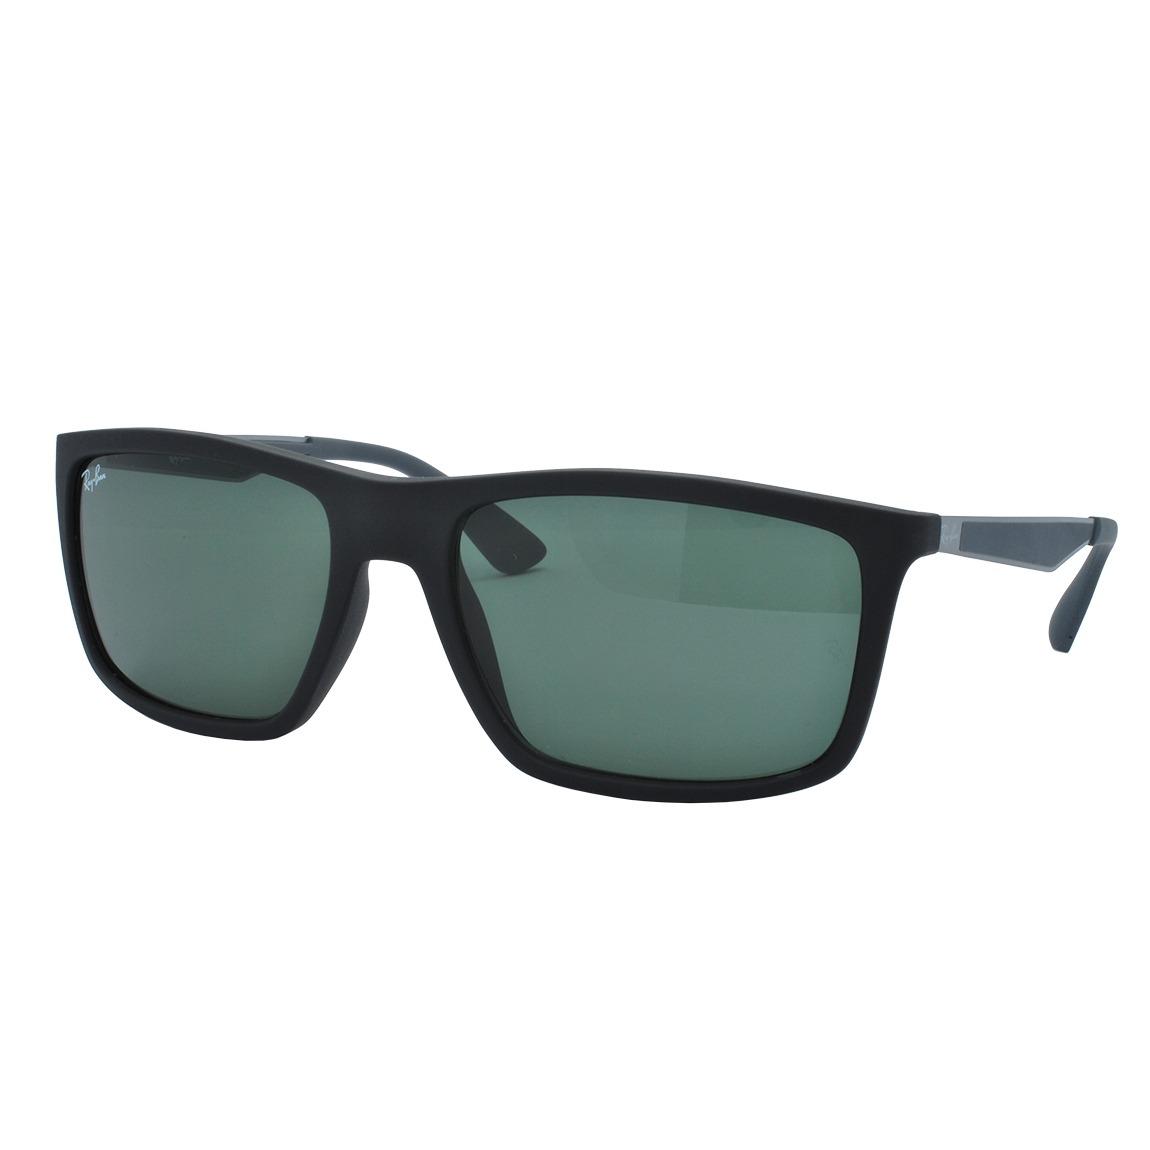 39c3ea0f8 óculos de sol ray ban original masculino rb4228l 601s71. Carregando zoom.